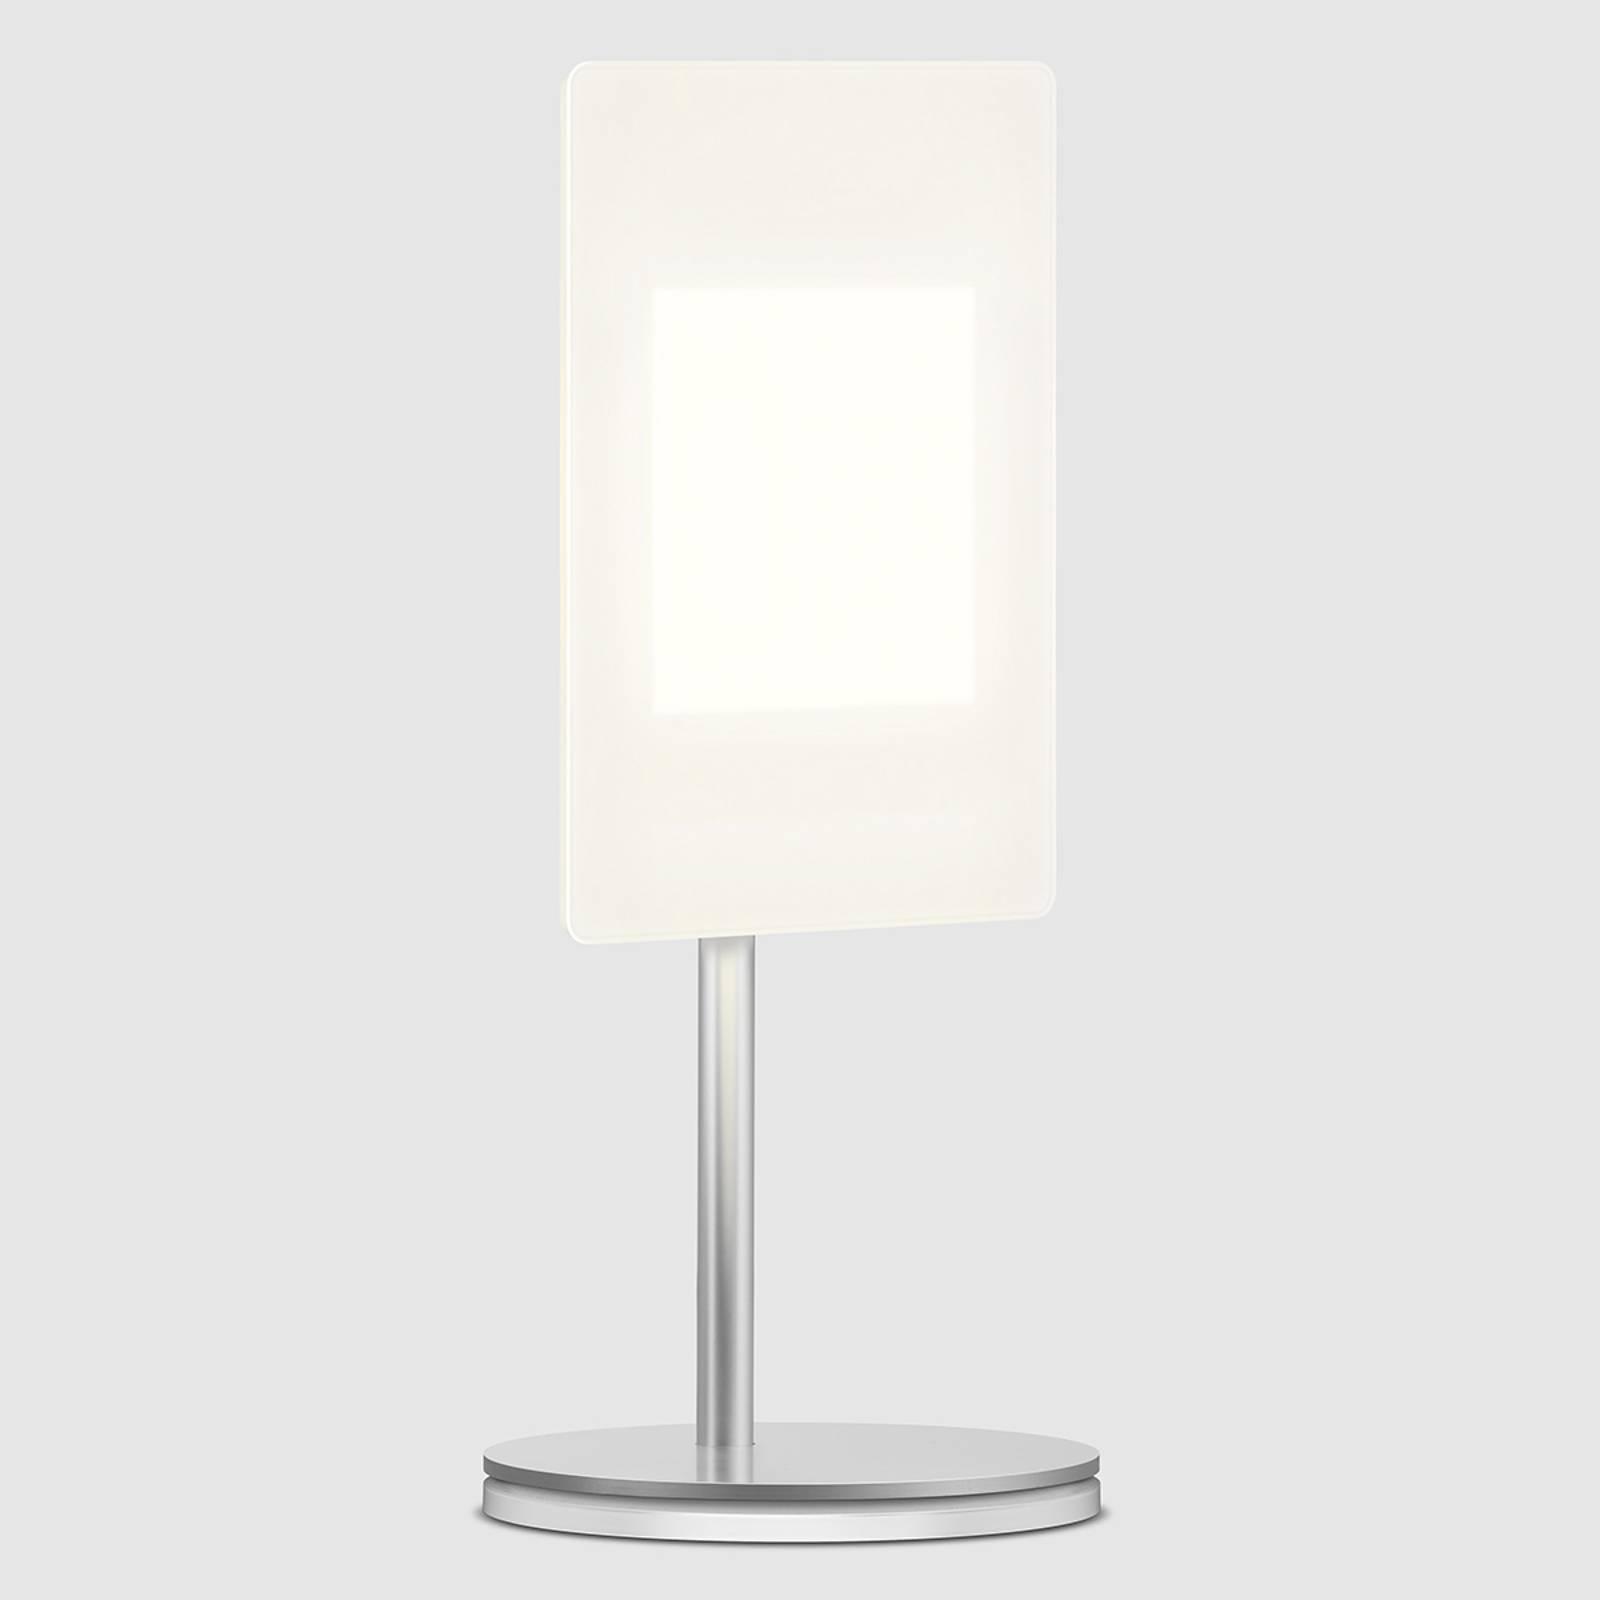 Lampe à poser OLED OMLED One t1 avec OLED, blanc